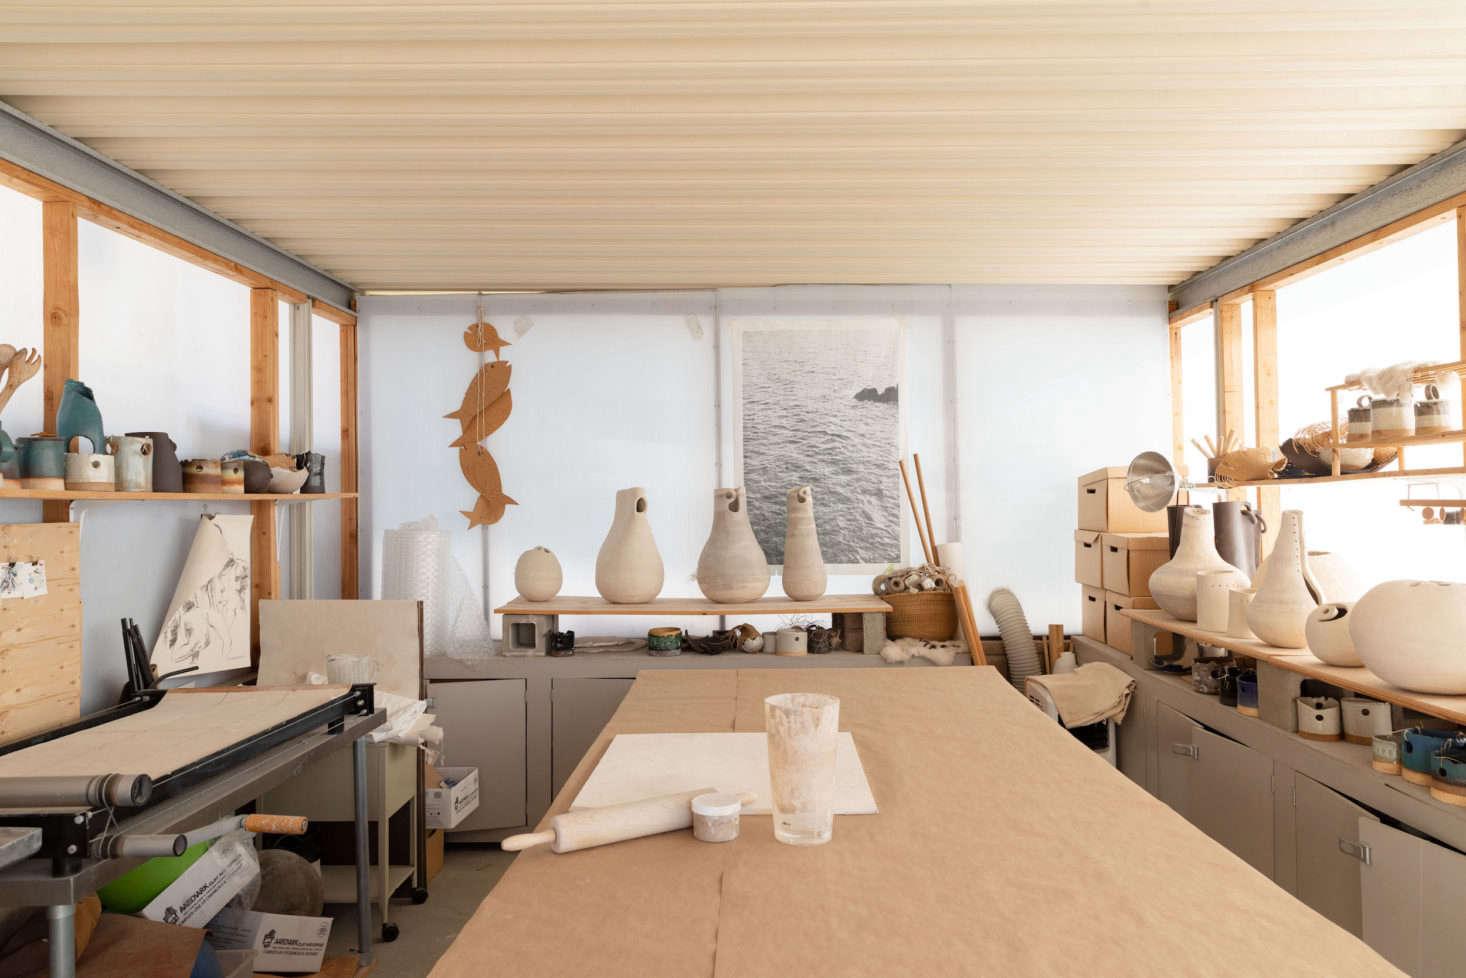 Wilkinson turned the garage into her studio.